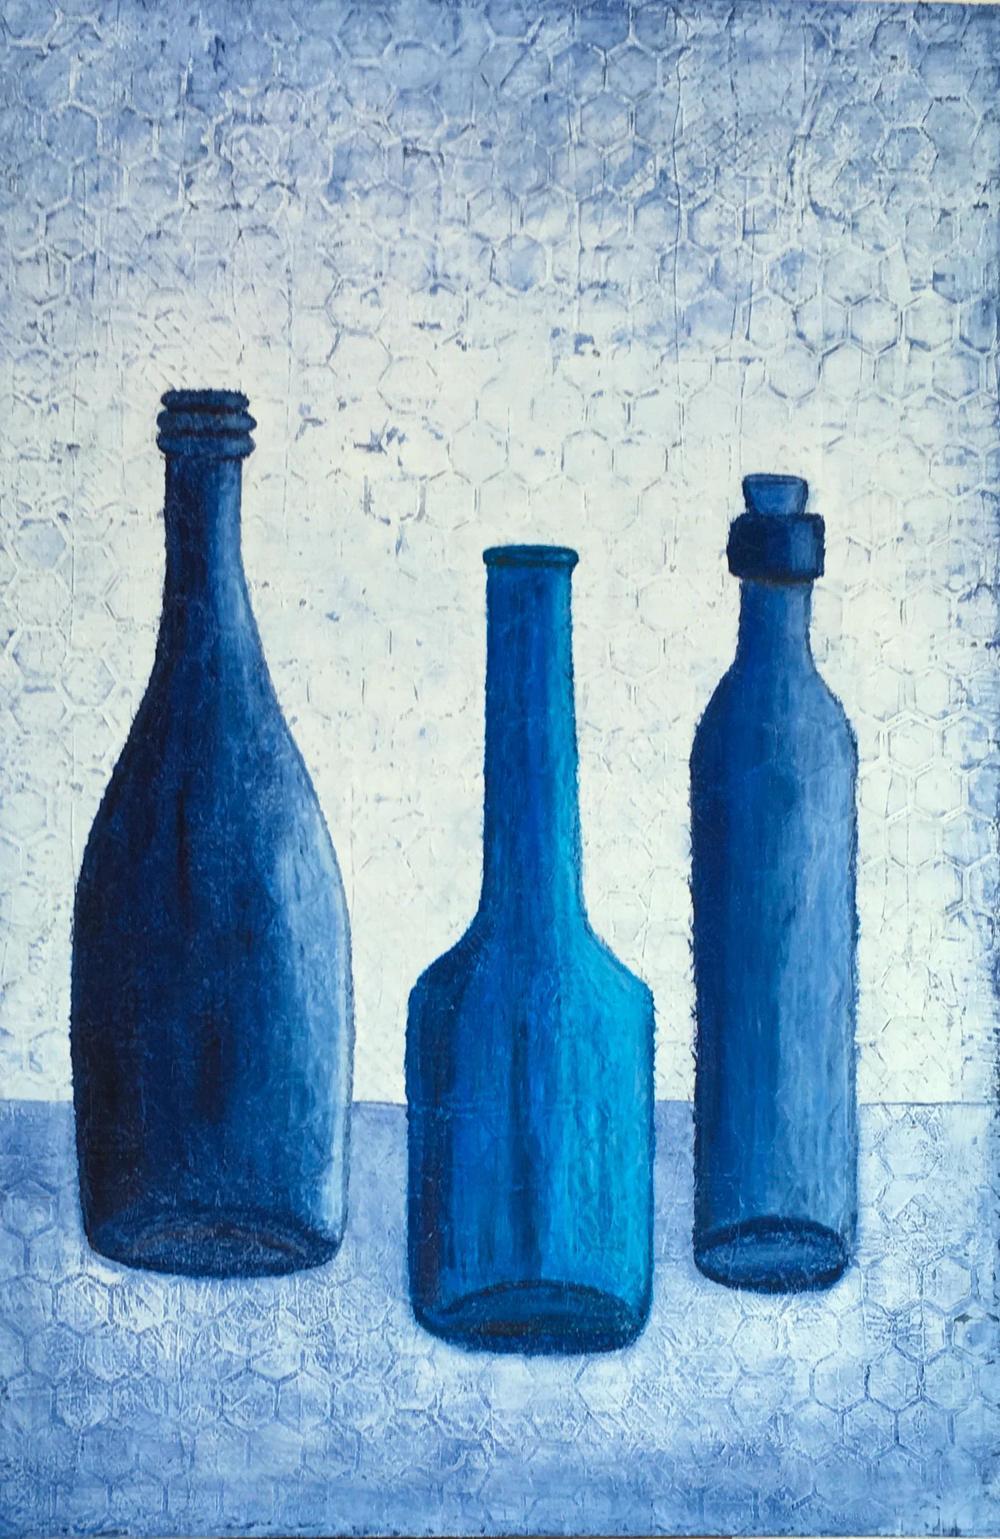 Bottle Blues - Terri Deskins